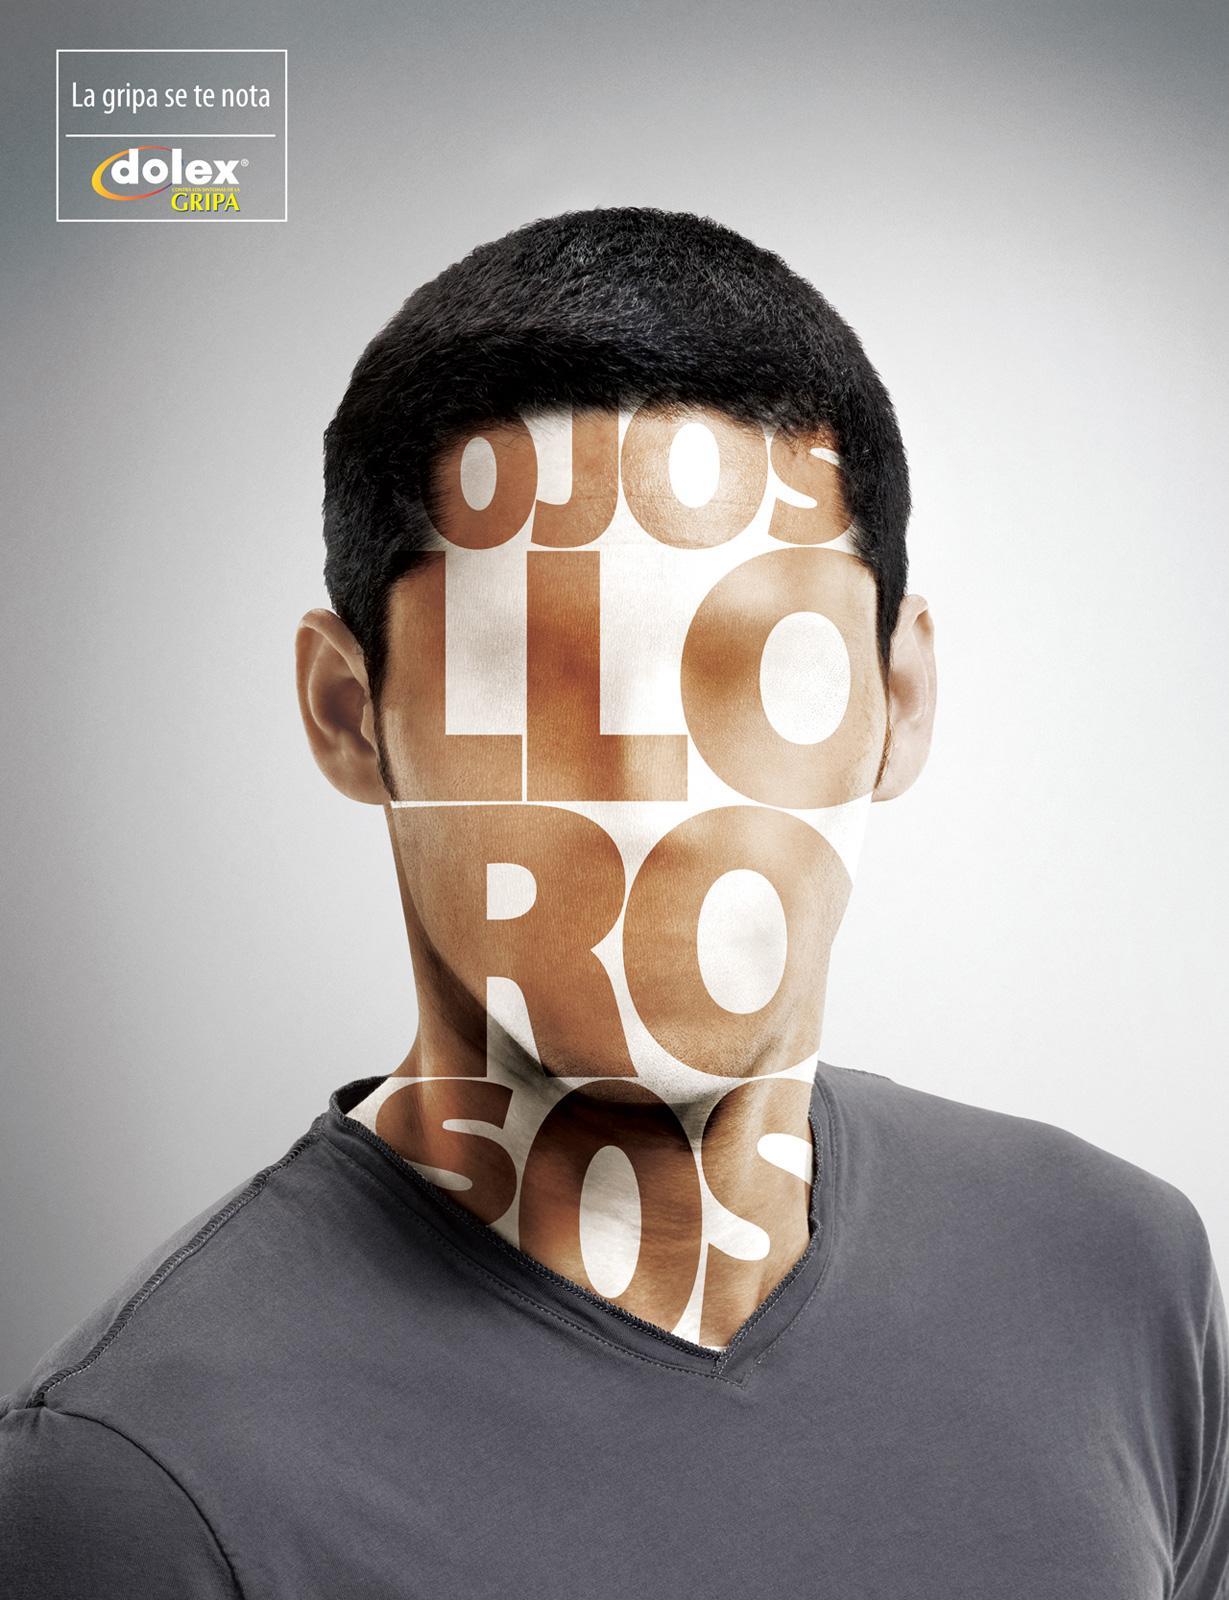 Dolex Print Ad -  Flu looks on you, 4